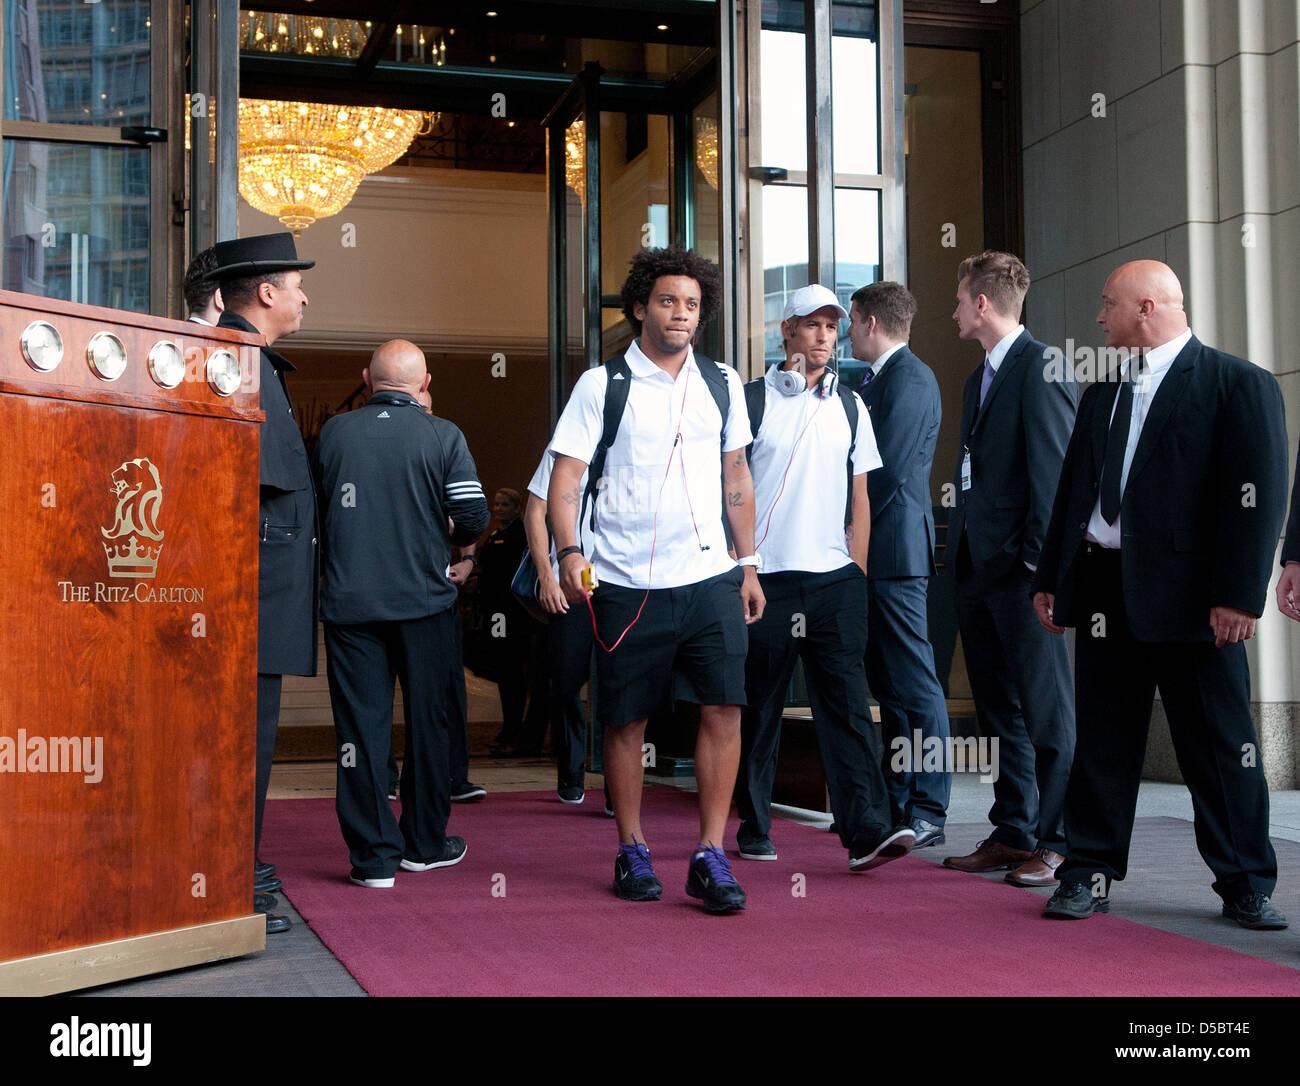 132b058f24e Marcelo Vieira da Silva Júnior of Real Madrid leaving hotel Ritz Carlton.  Berlin